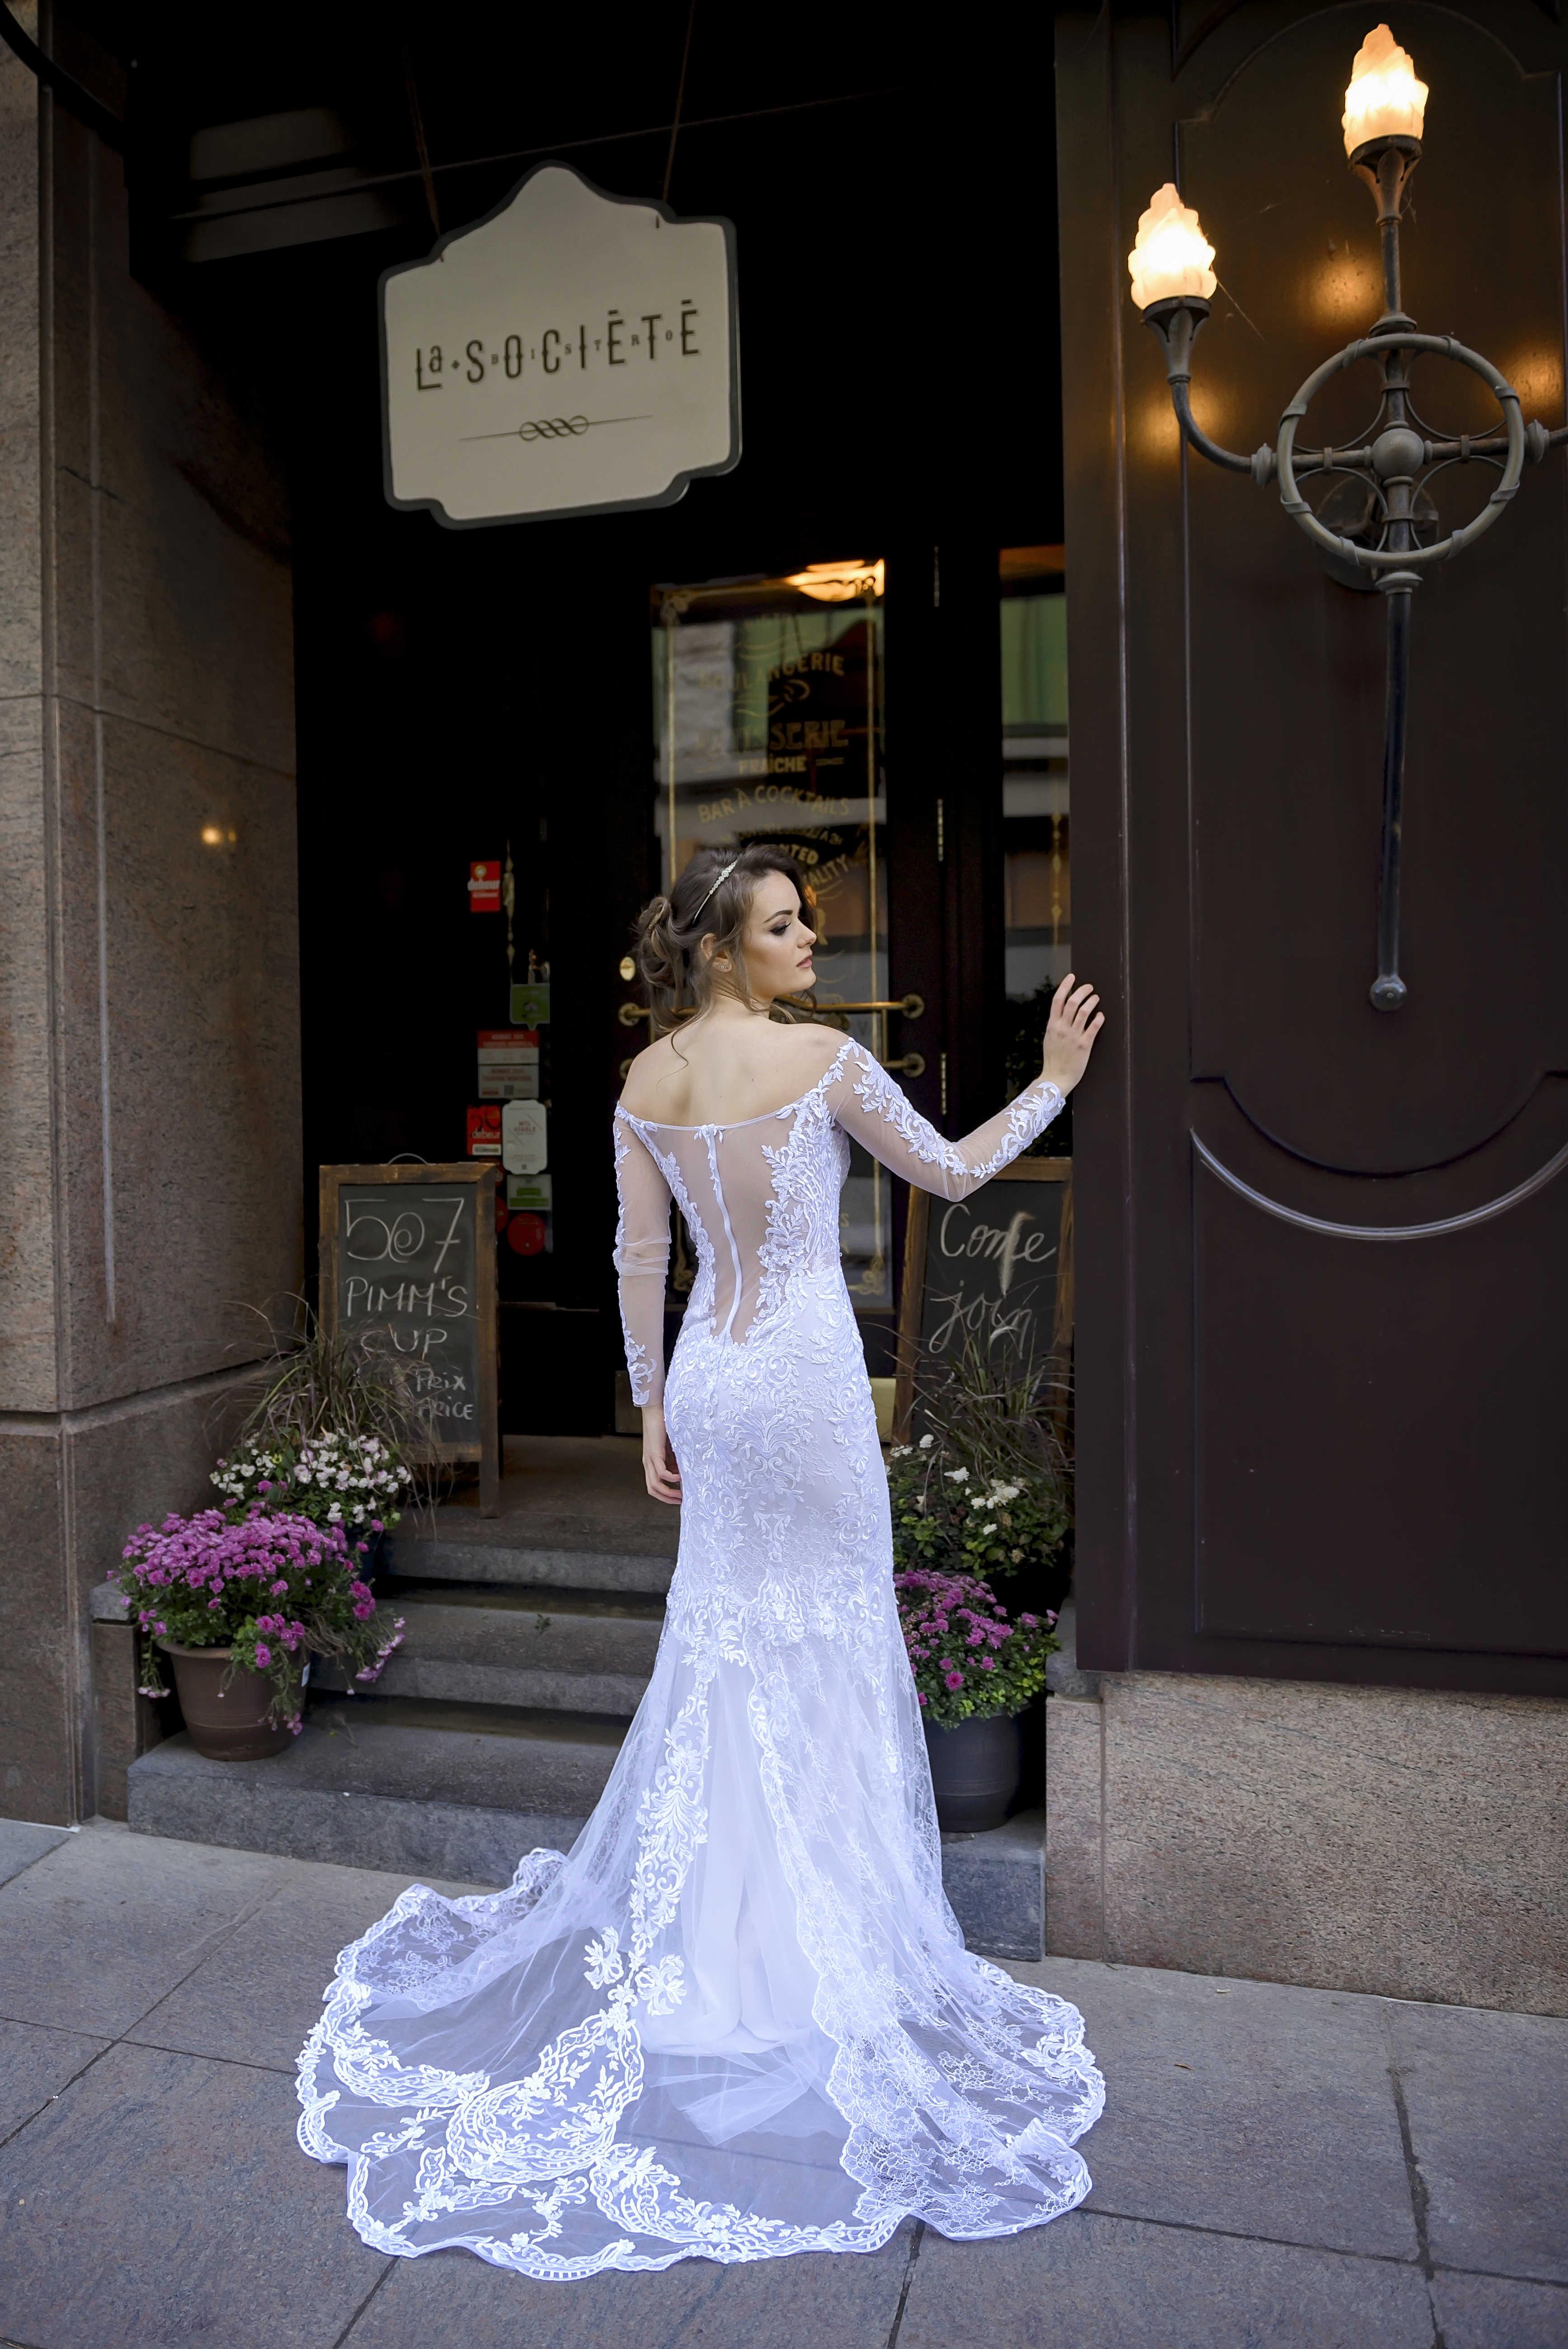 lilia haute couture robes de mariee montreal dentelle blanche dentelle chantilly dentelle francaise